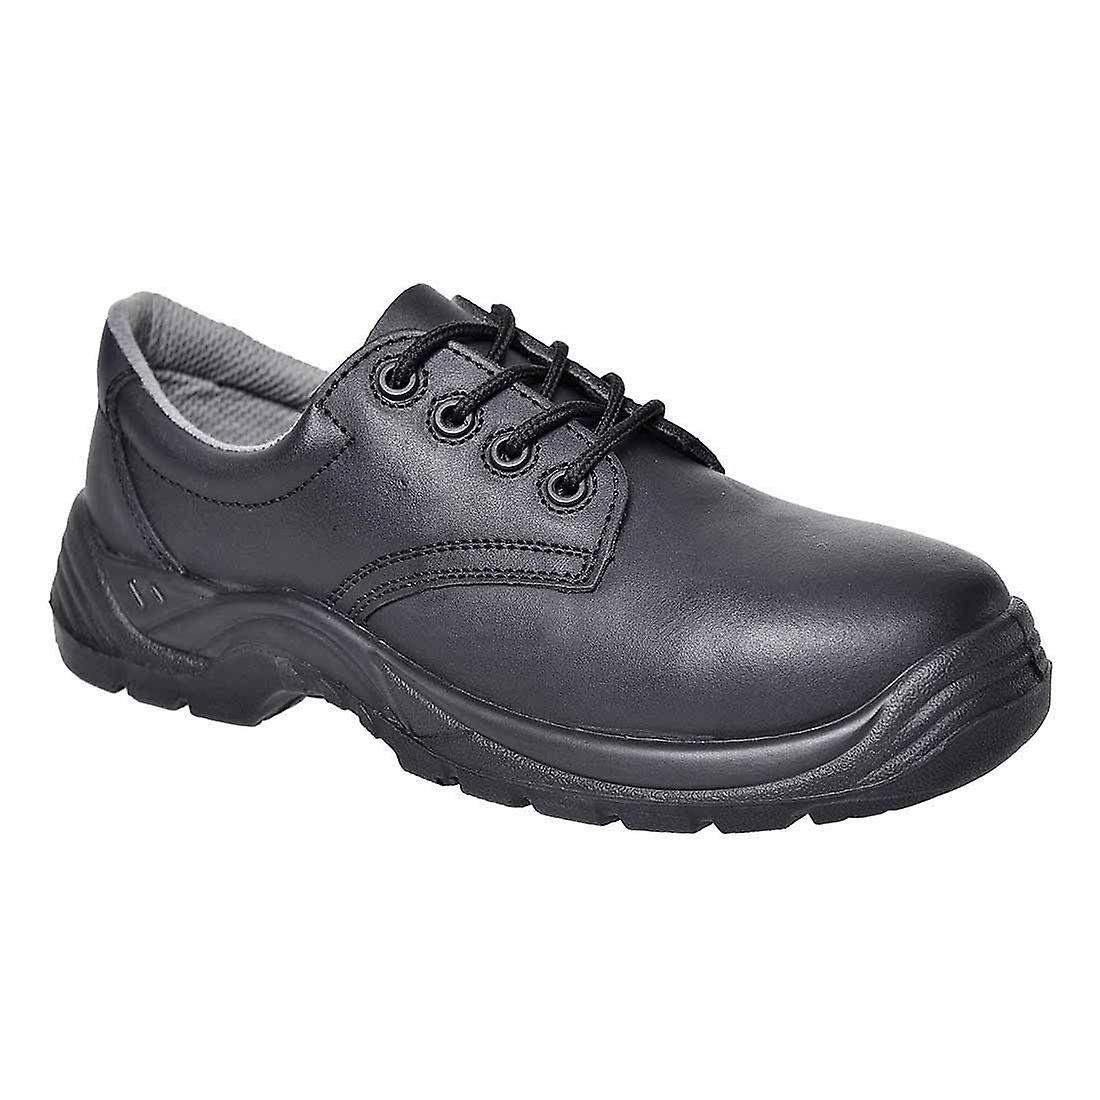 Portwest - Compositelite Work Safety Shoe S1